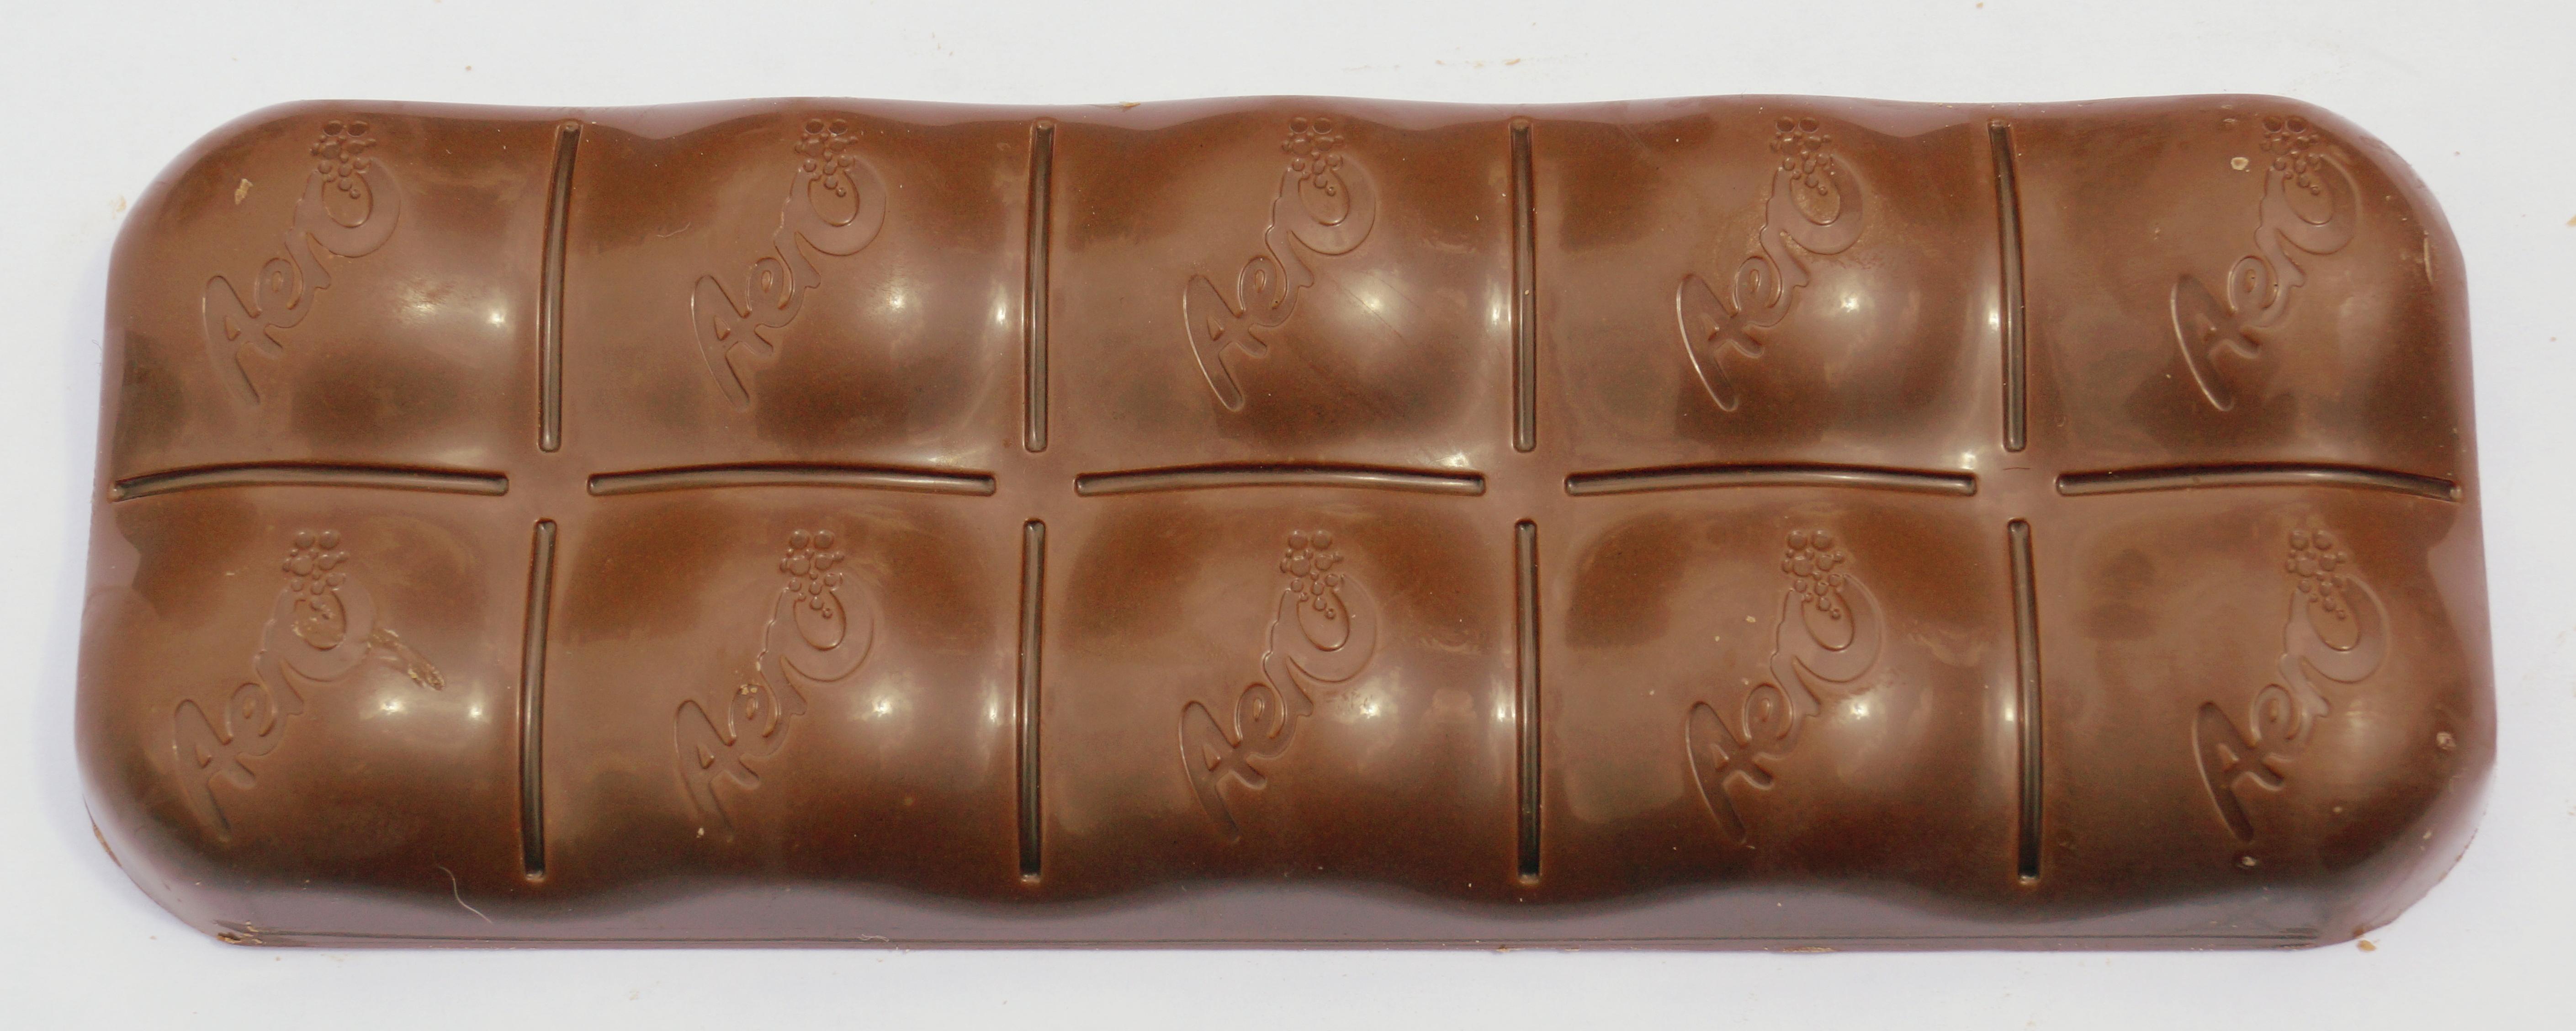 Chocolate Coffee Caramel Bars